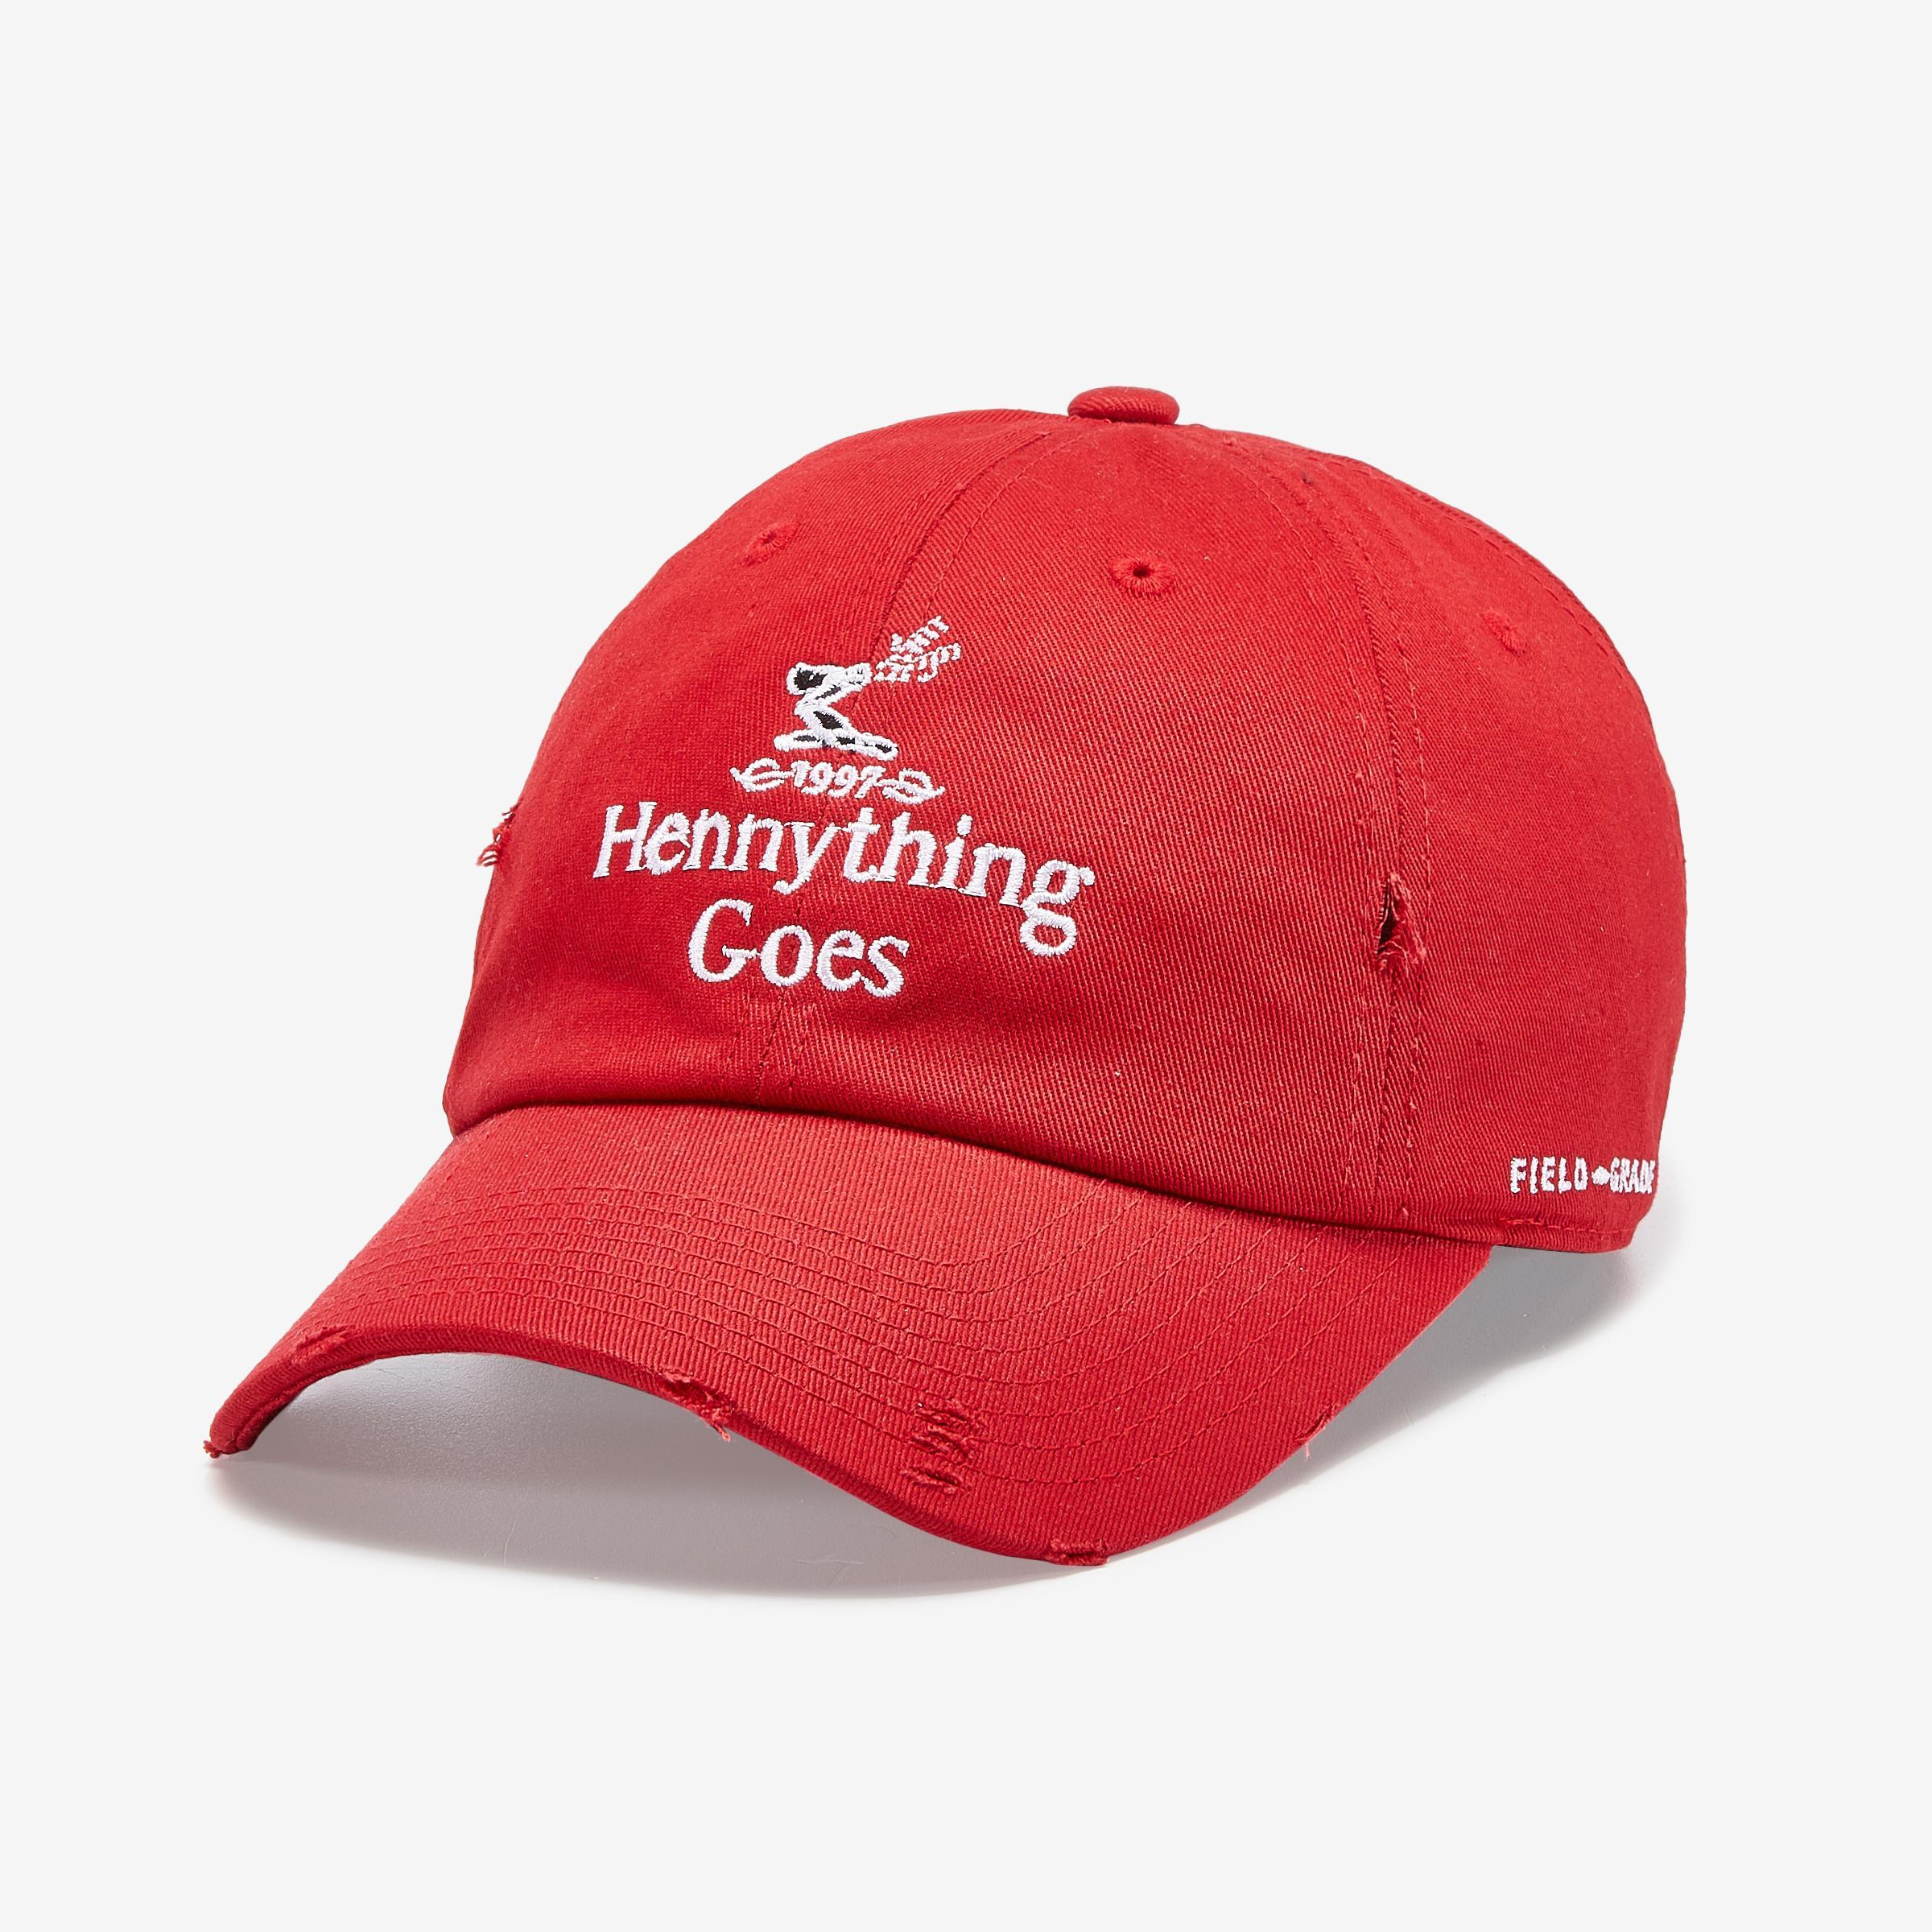 Hennything Goes Hat